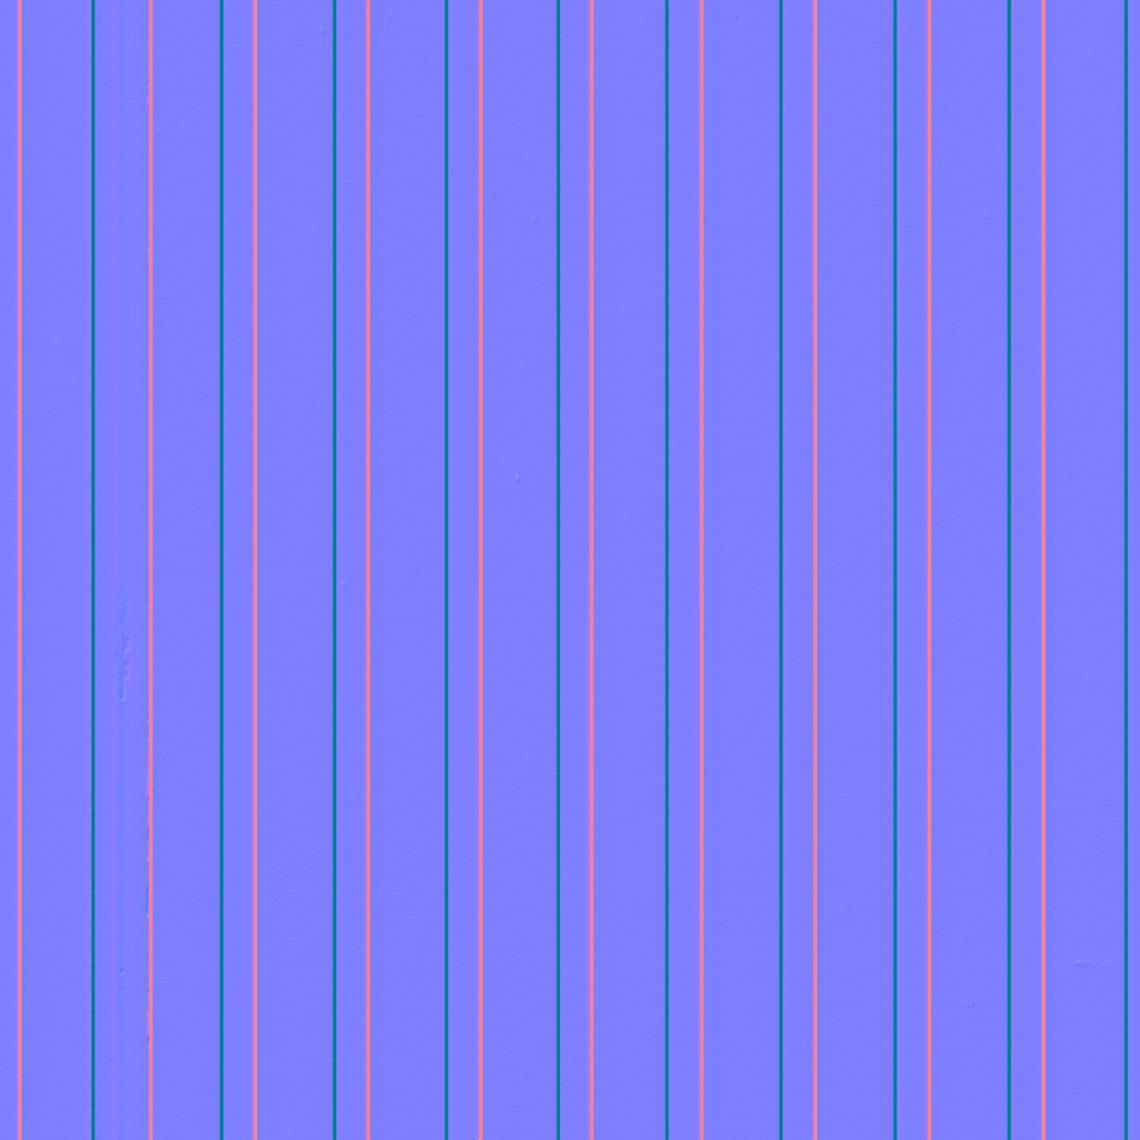 Corrugated-Metal-01-Normal